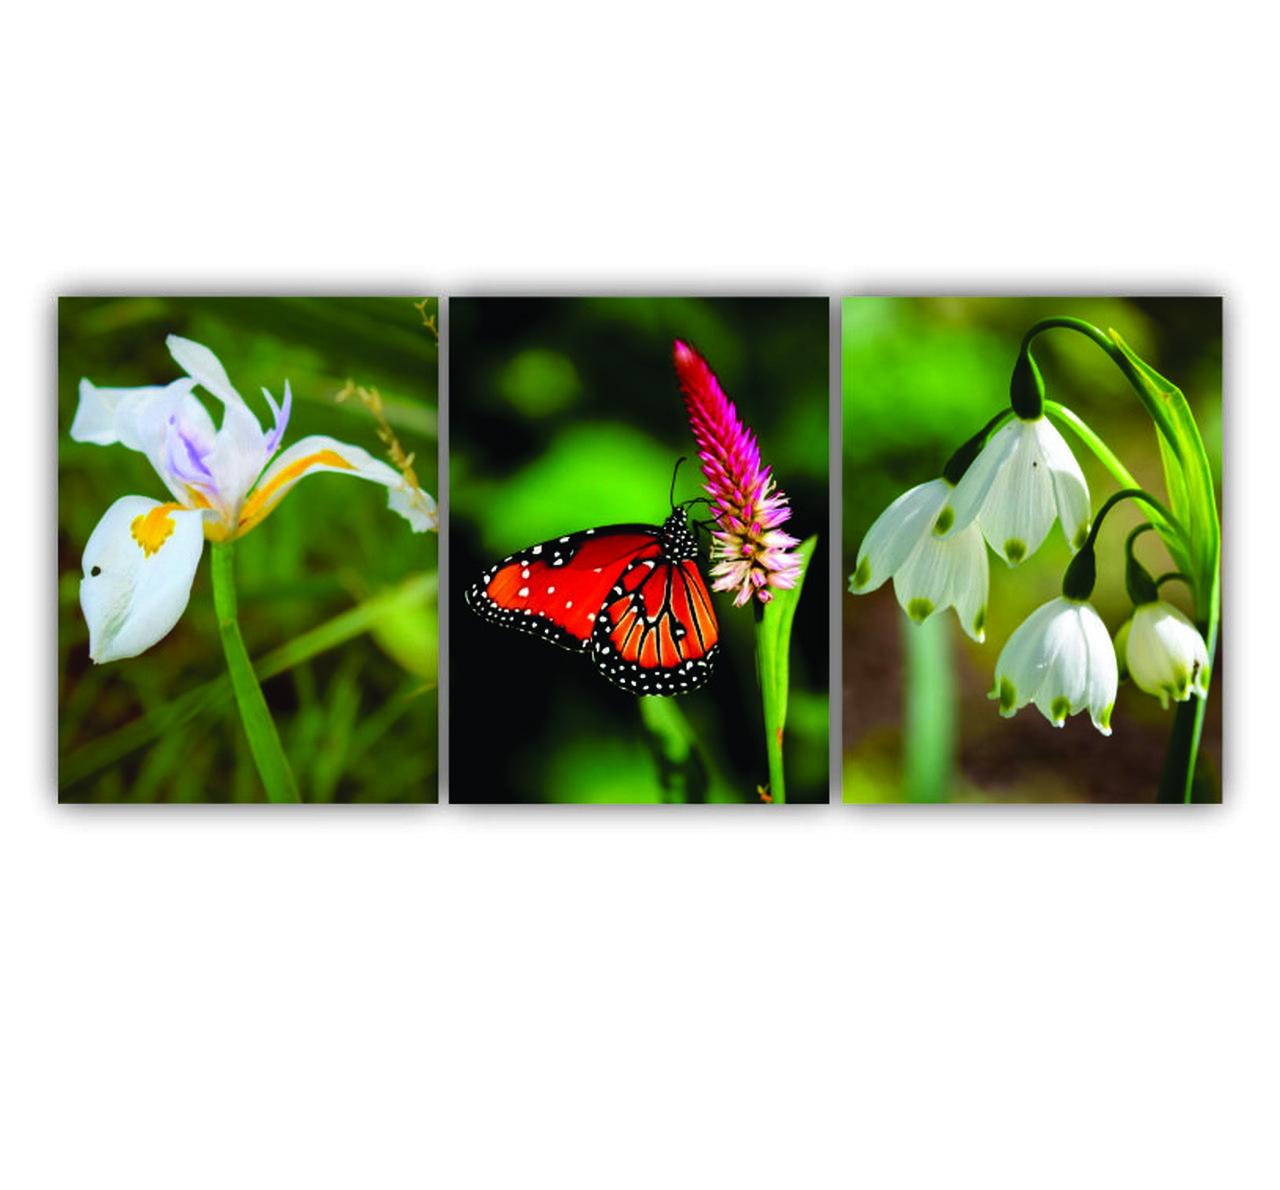 Quadro Flor e Borboleta Primavera Colors - Kit 3 telas